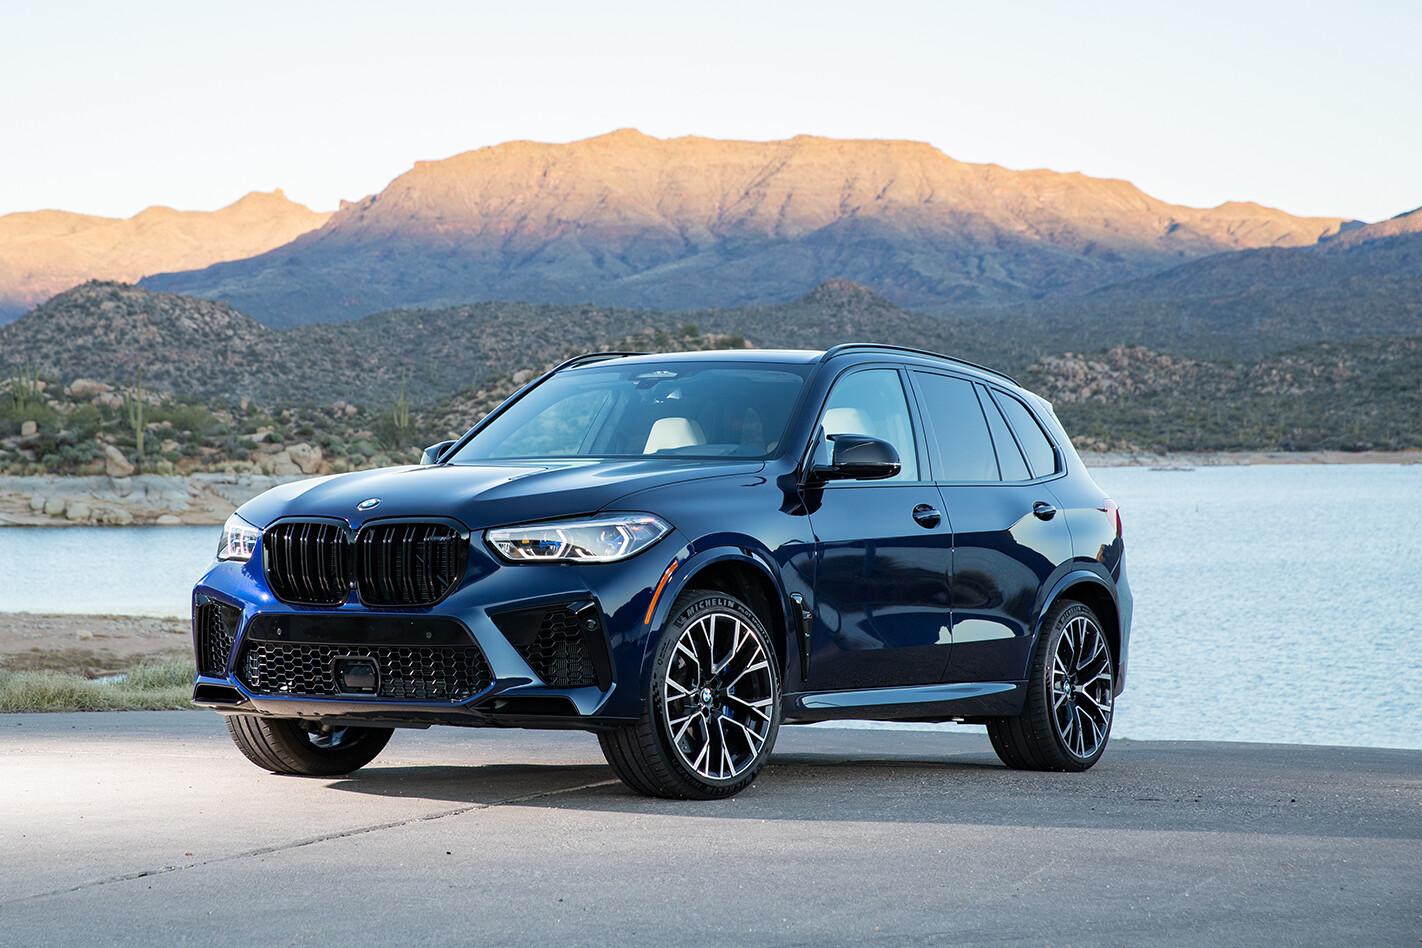 2020 BMW X5M Exterior